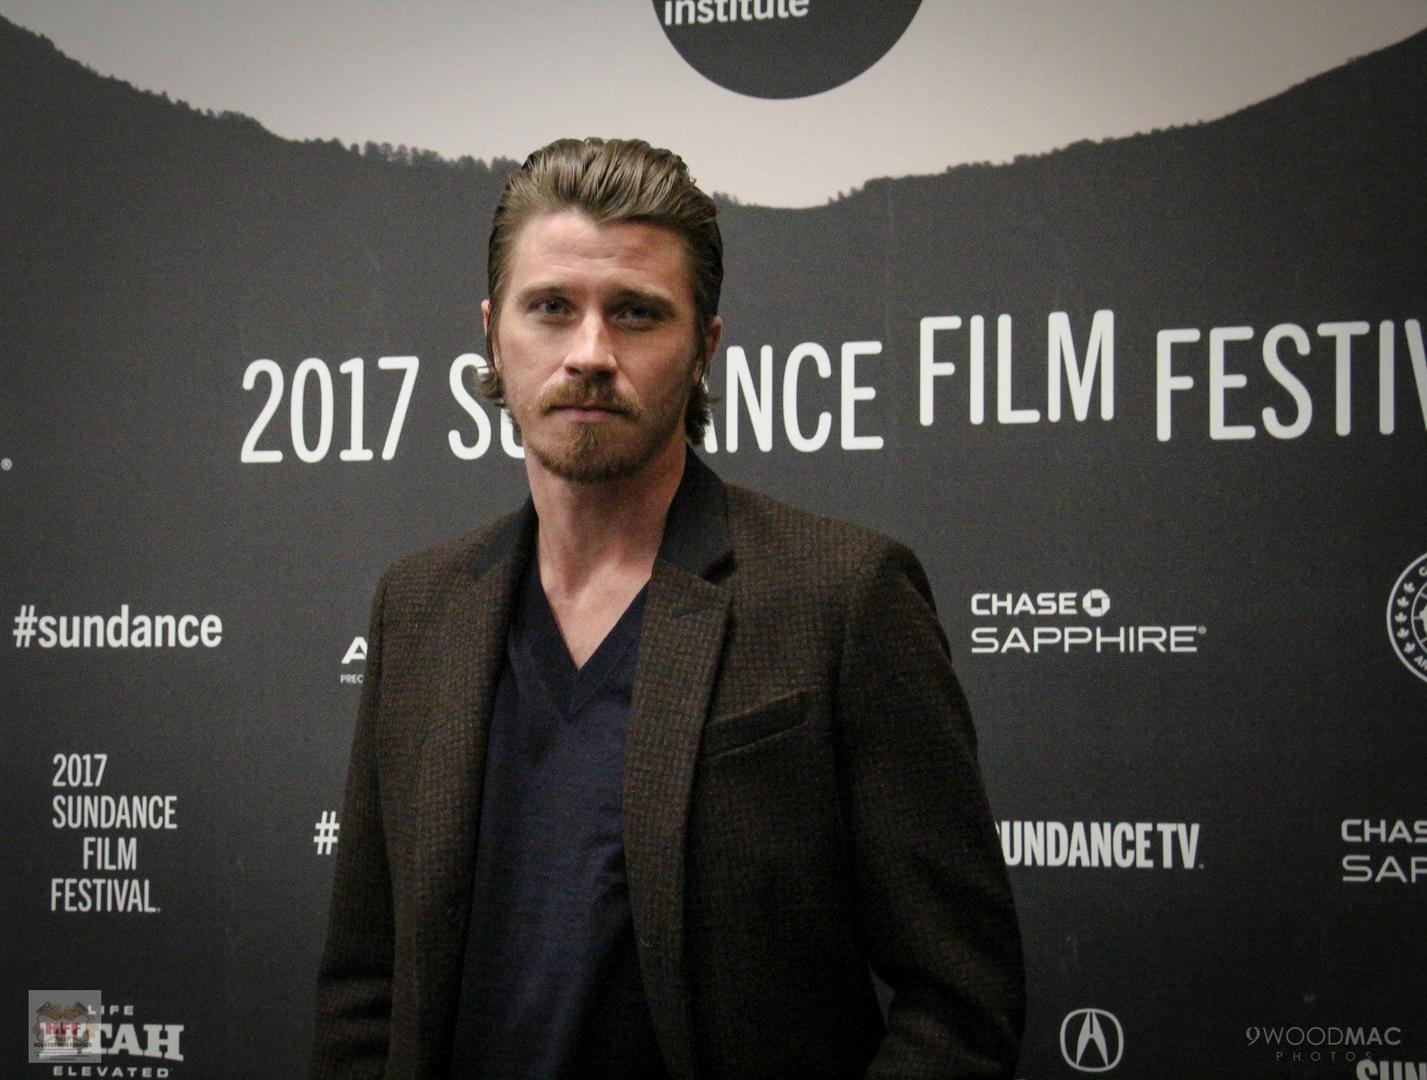 Garrett Hedlund Filmes in sundance film festival 2017